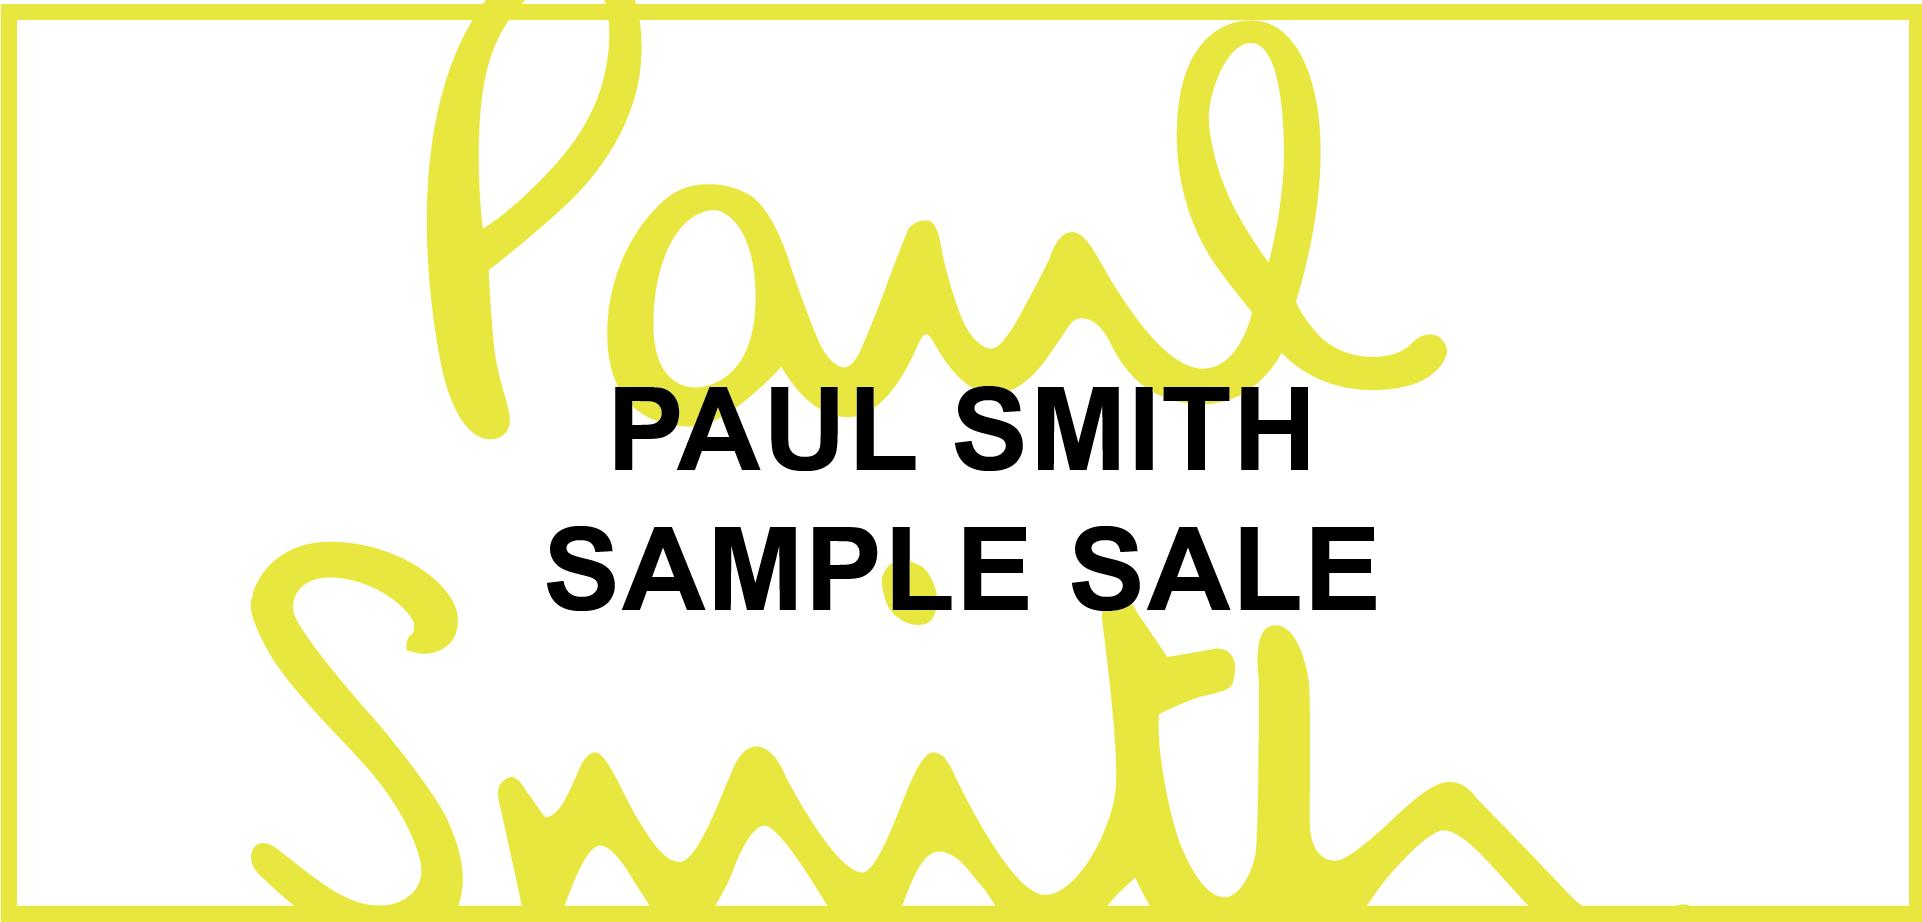 PaulSmith_Banner.png